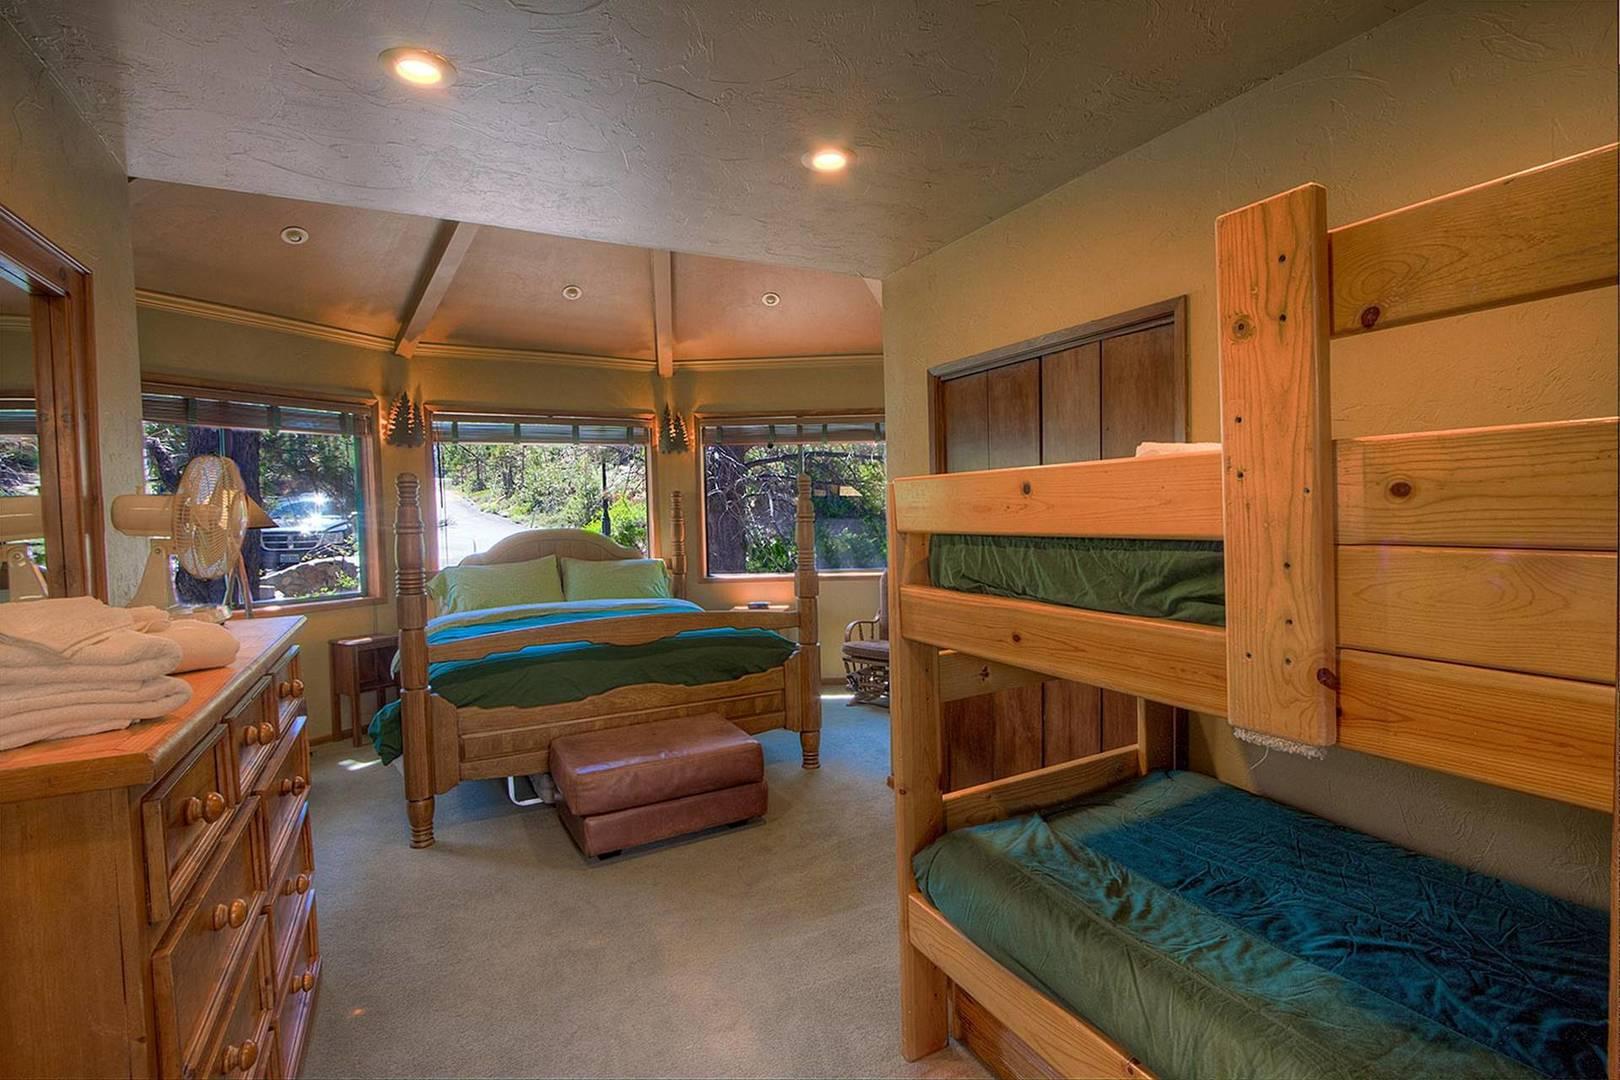 ivh1810 bedroom